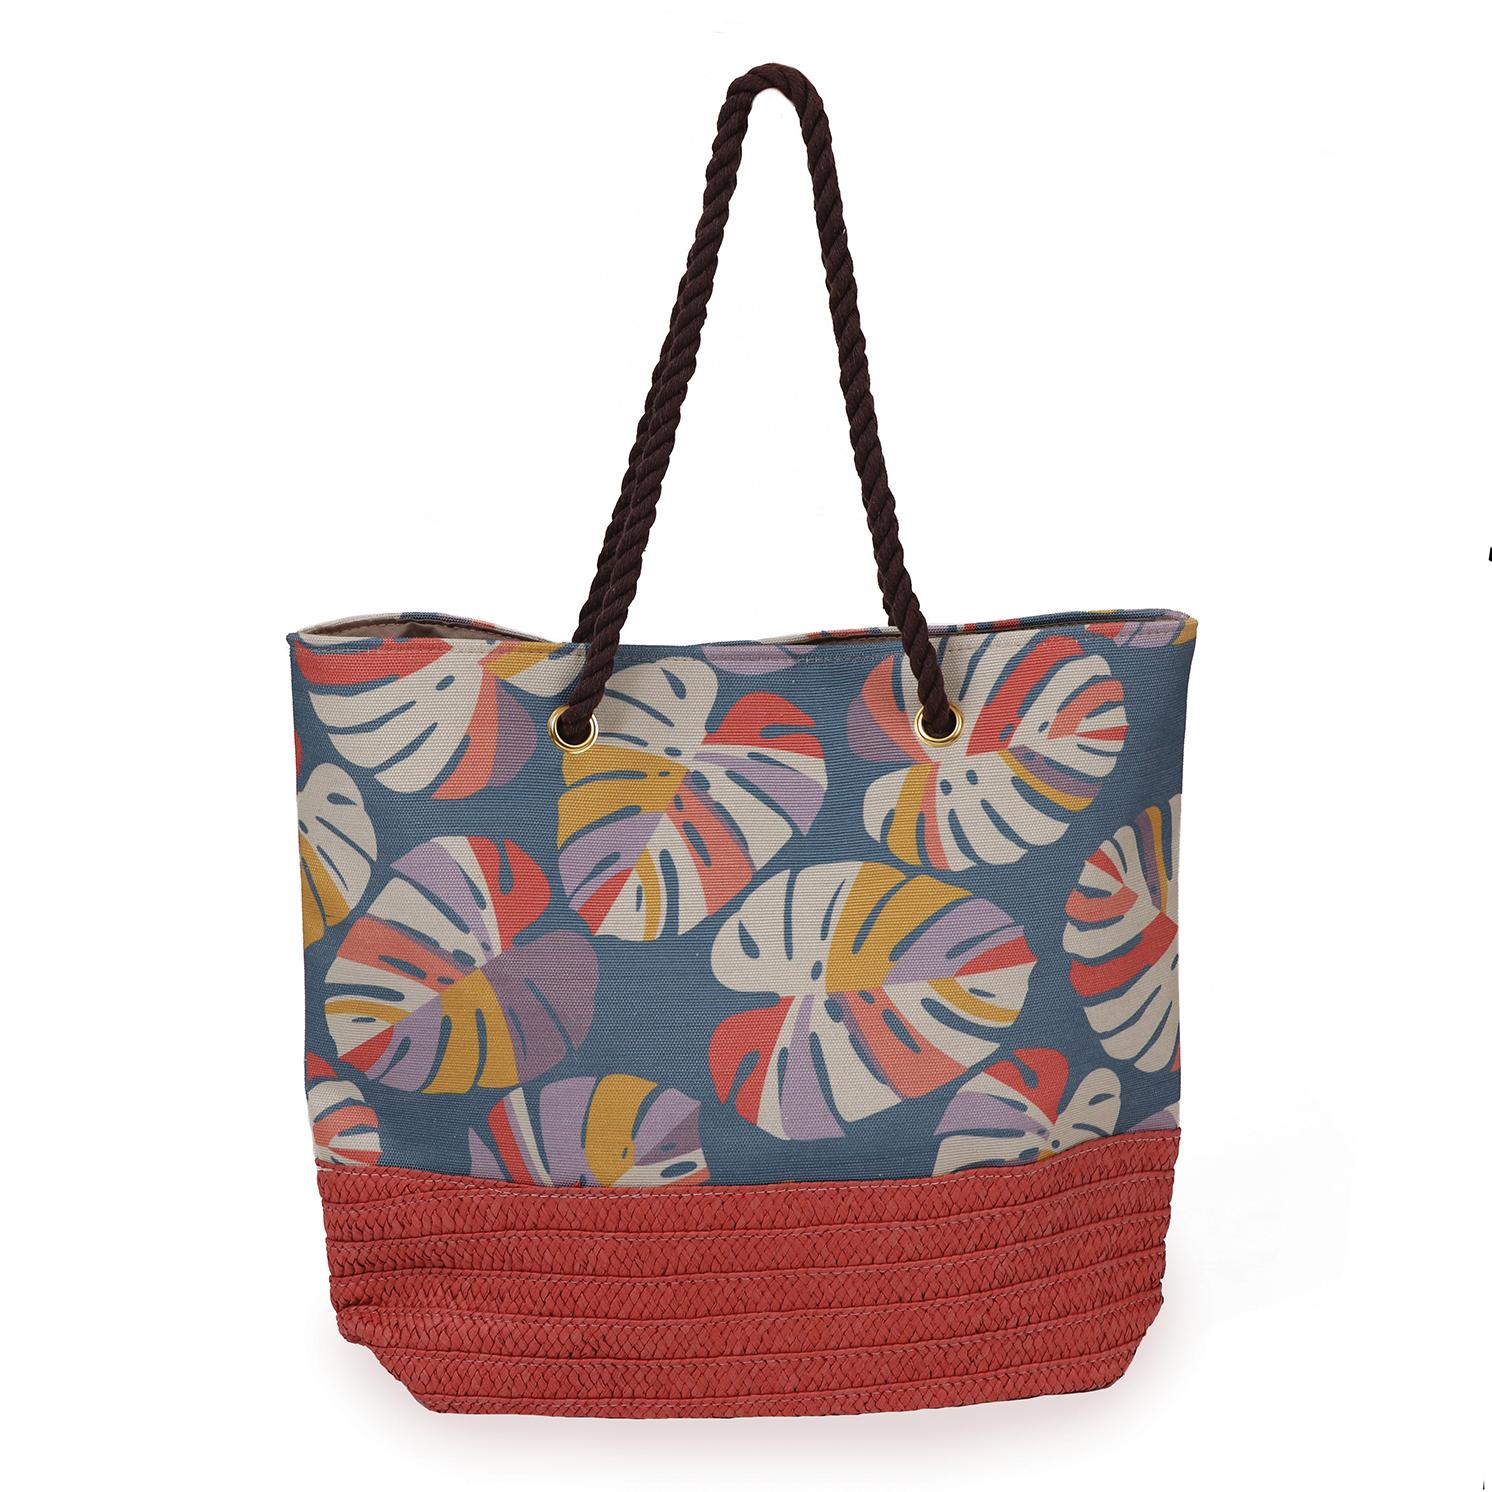 Powder – Teal Palm Leaf Print Beach Bag